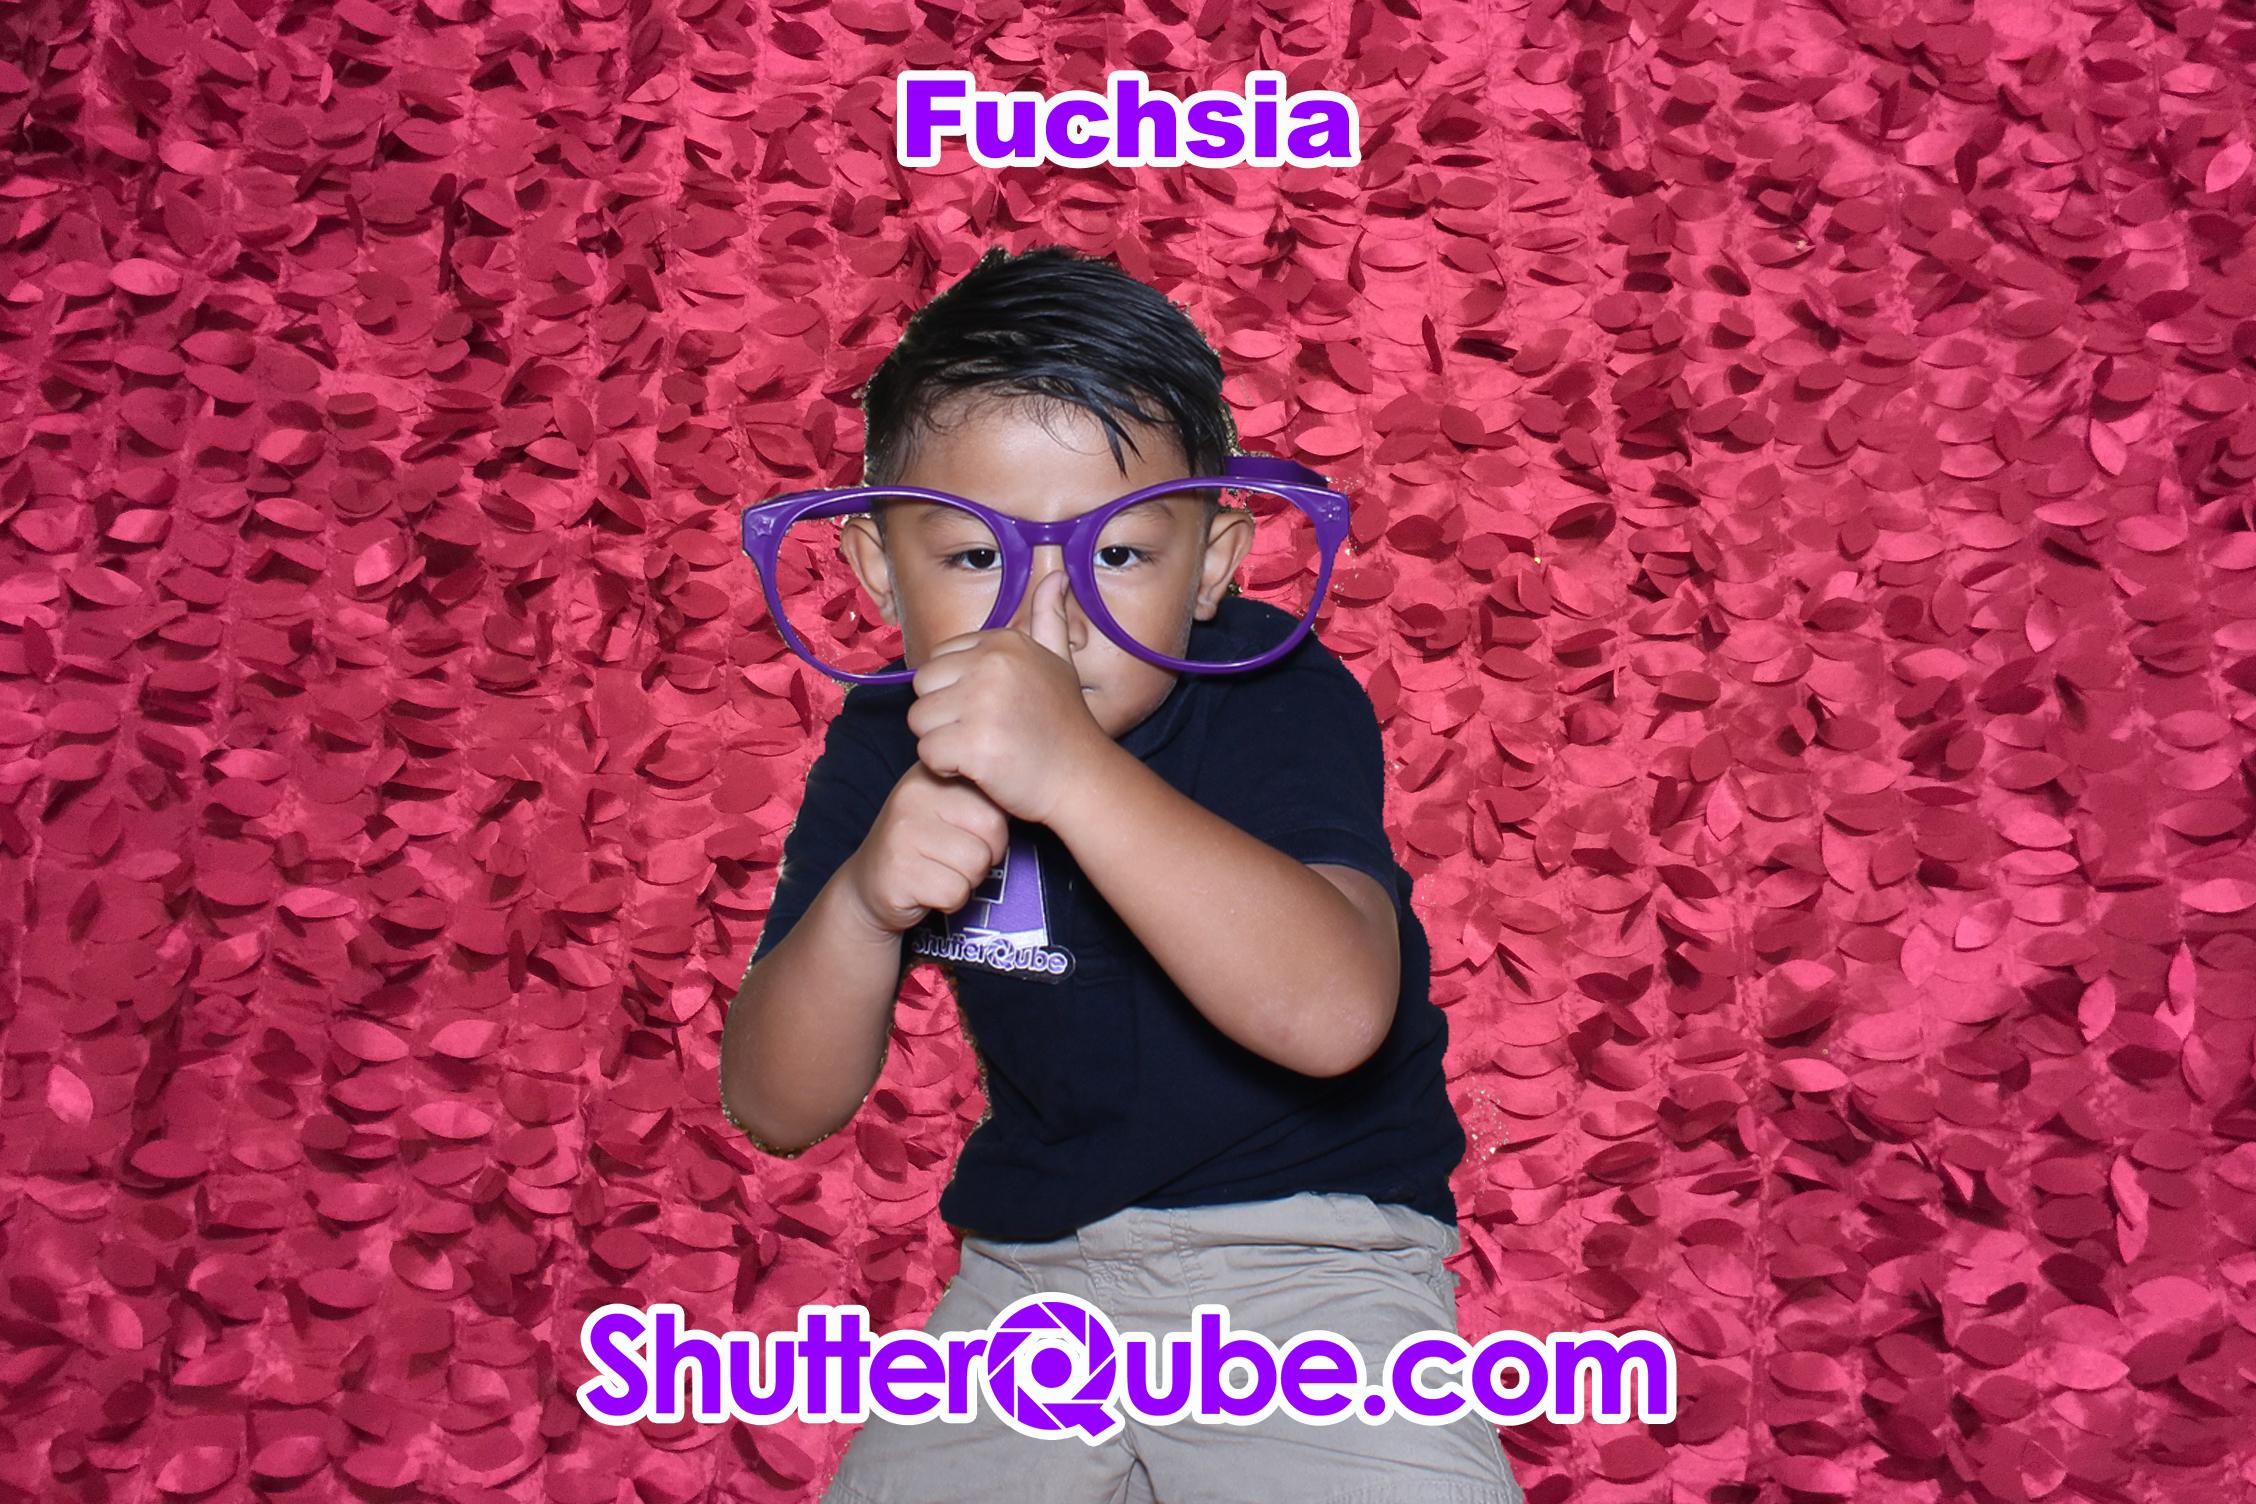 fuchsia leaf photo booth backdrop